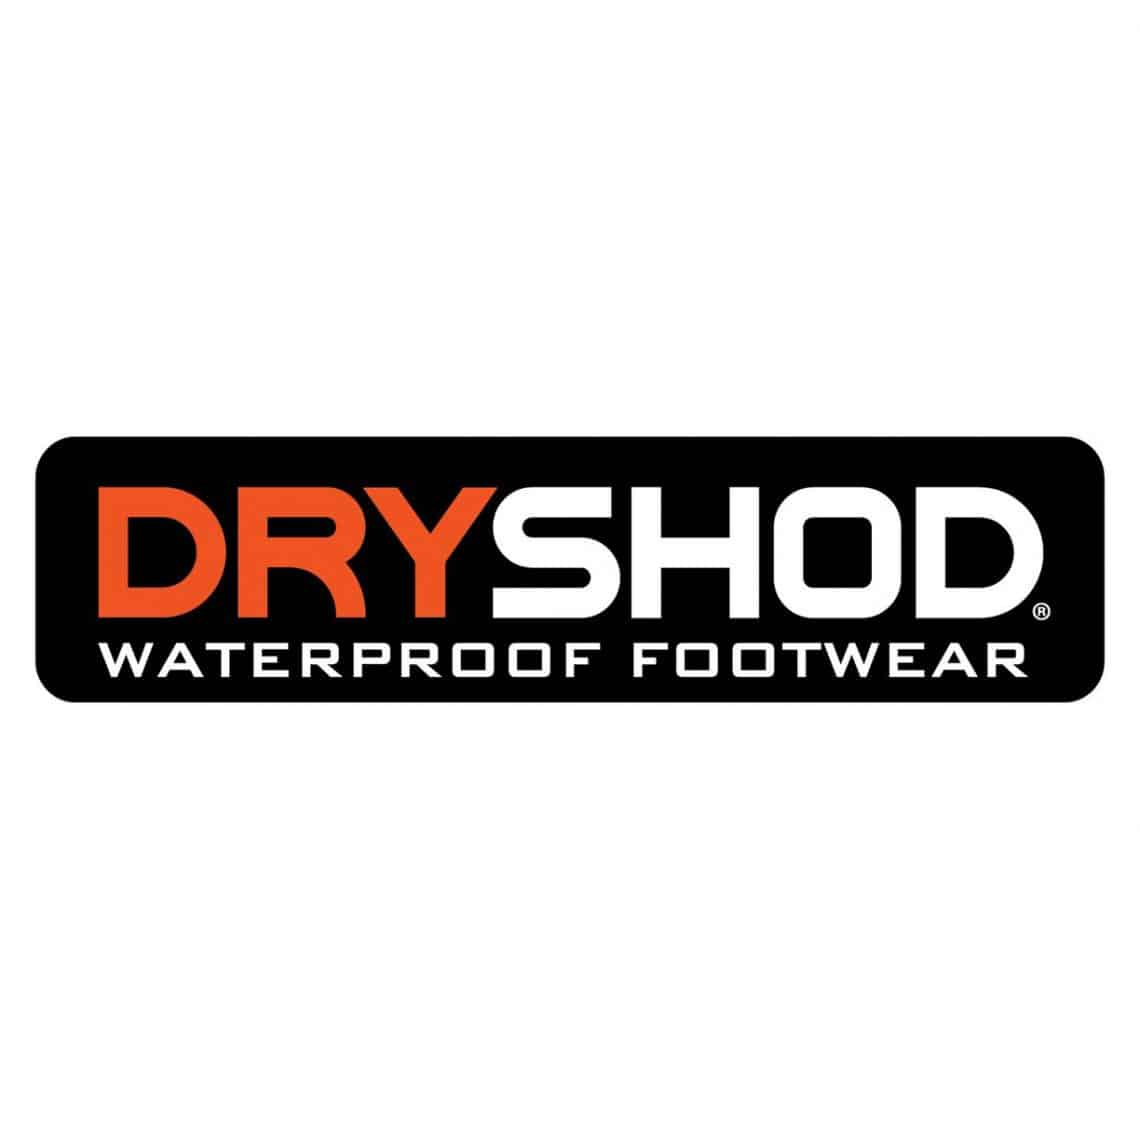 DRYSHOD